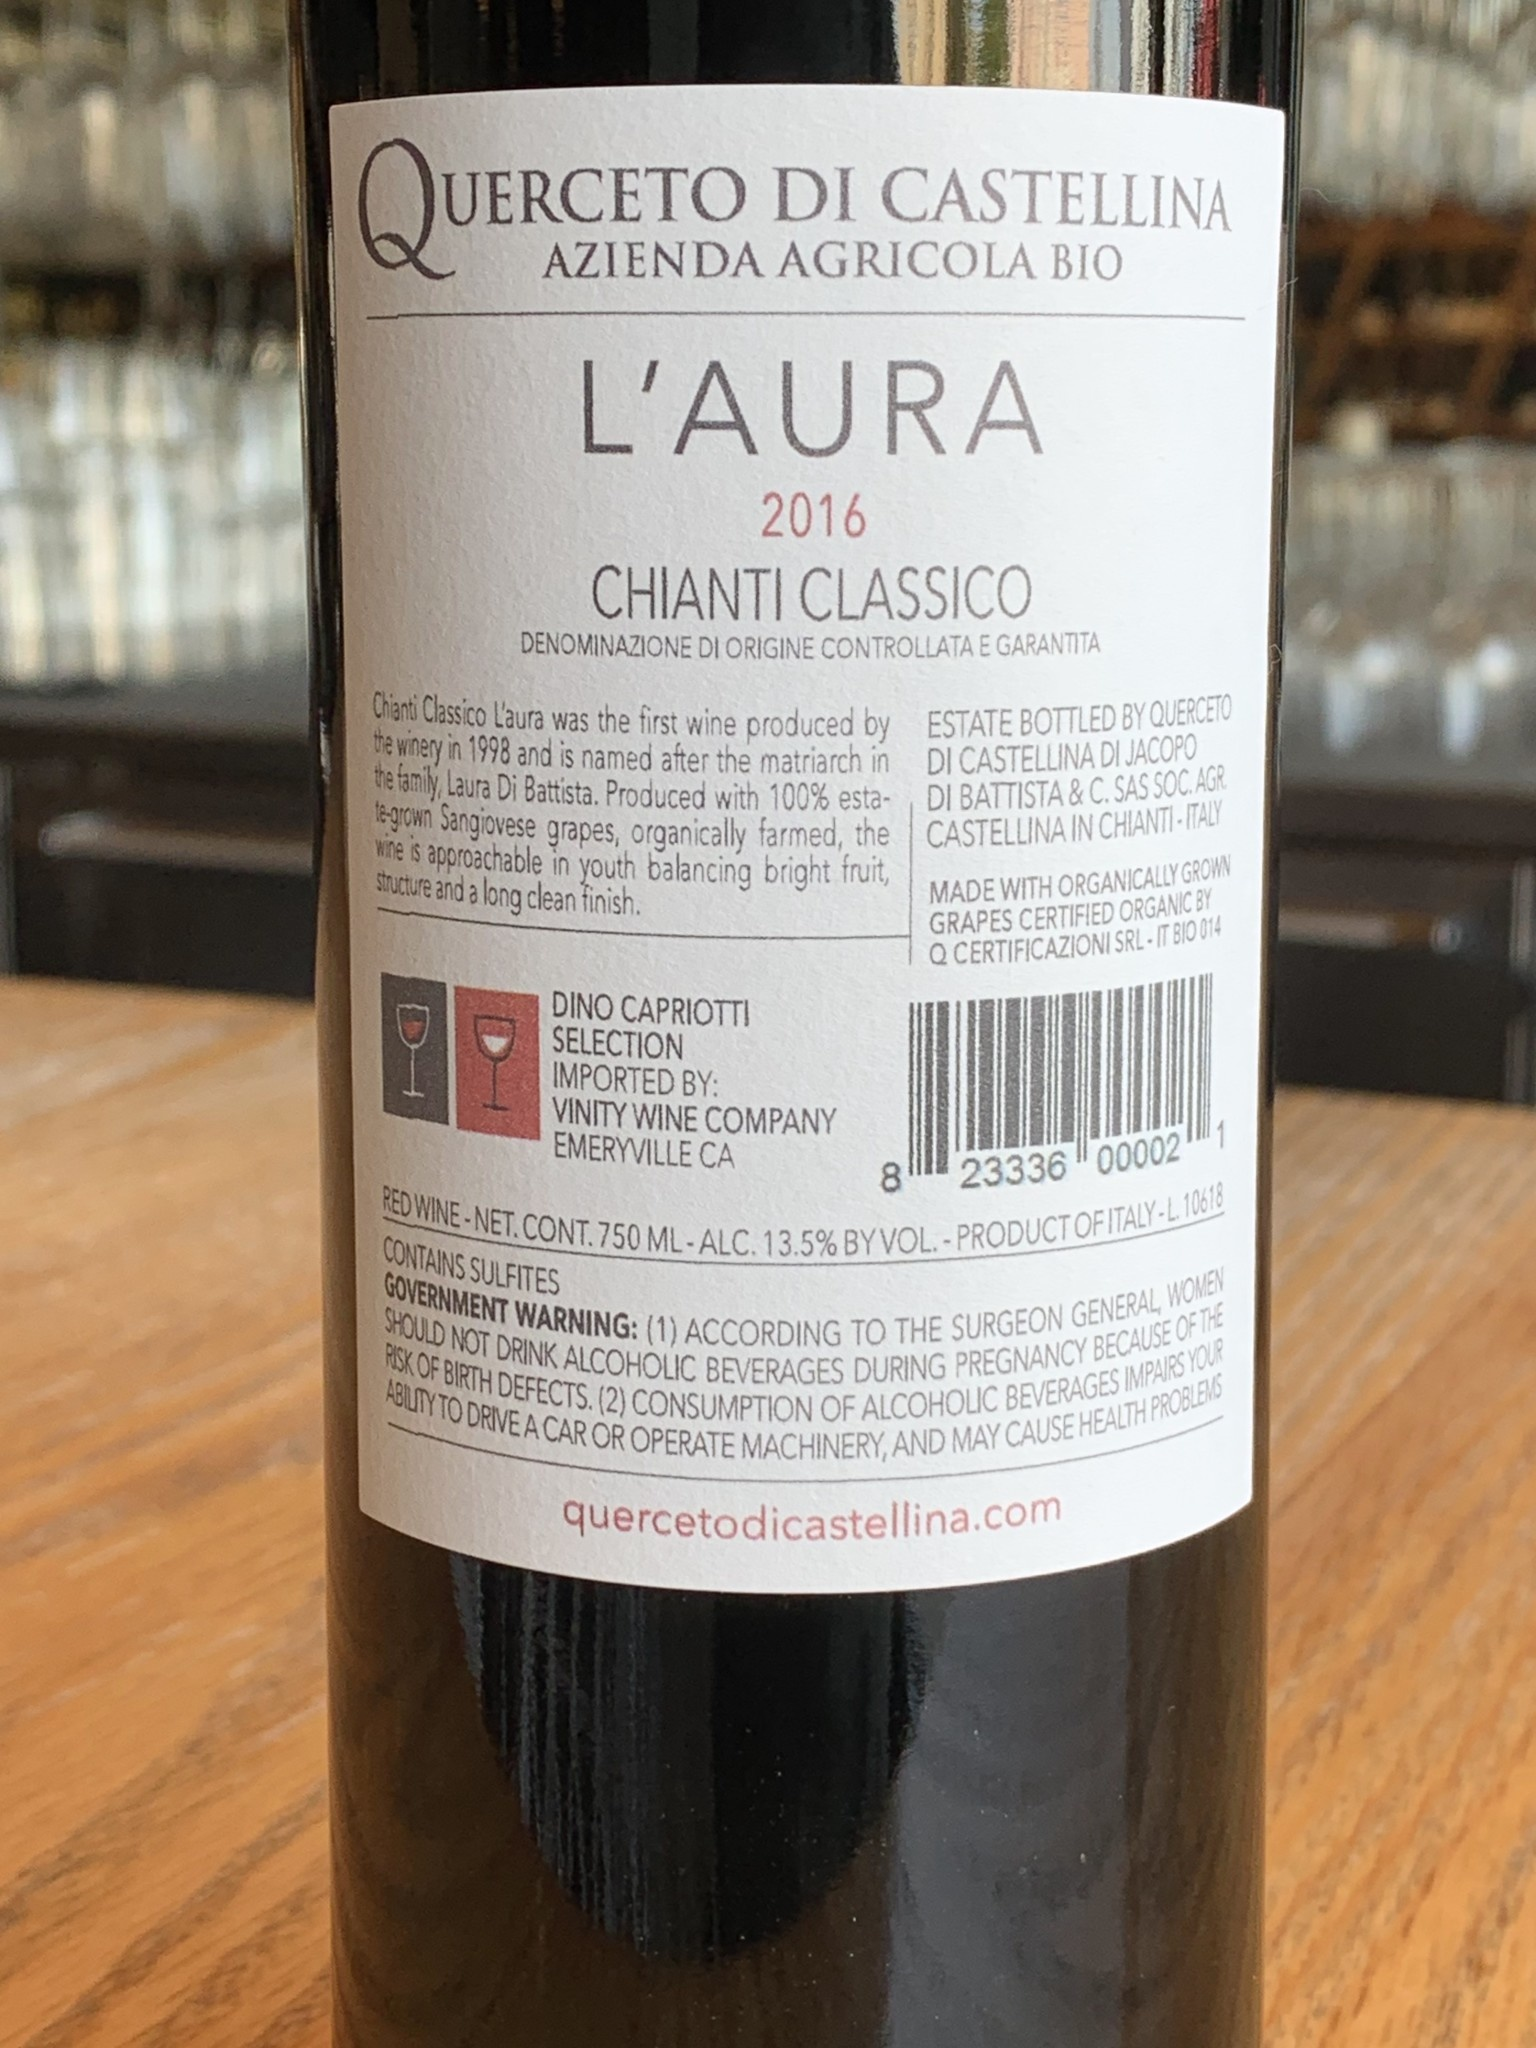 "Querceto di Castellina 2016 Querceto di Castellina ""L'Aura"" Chianti Classico 750ml"